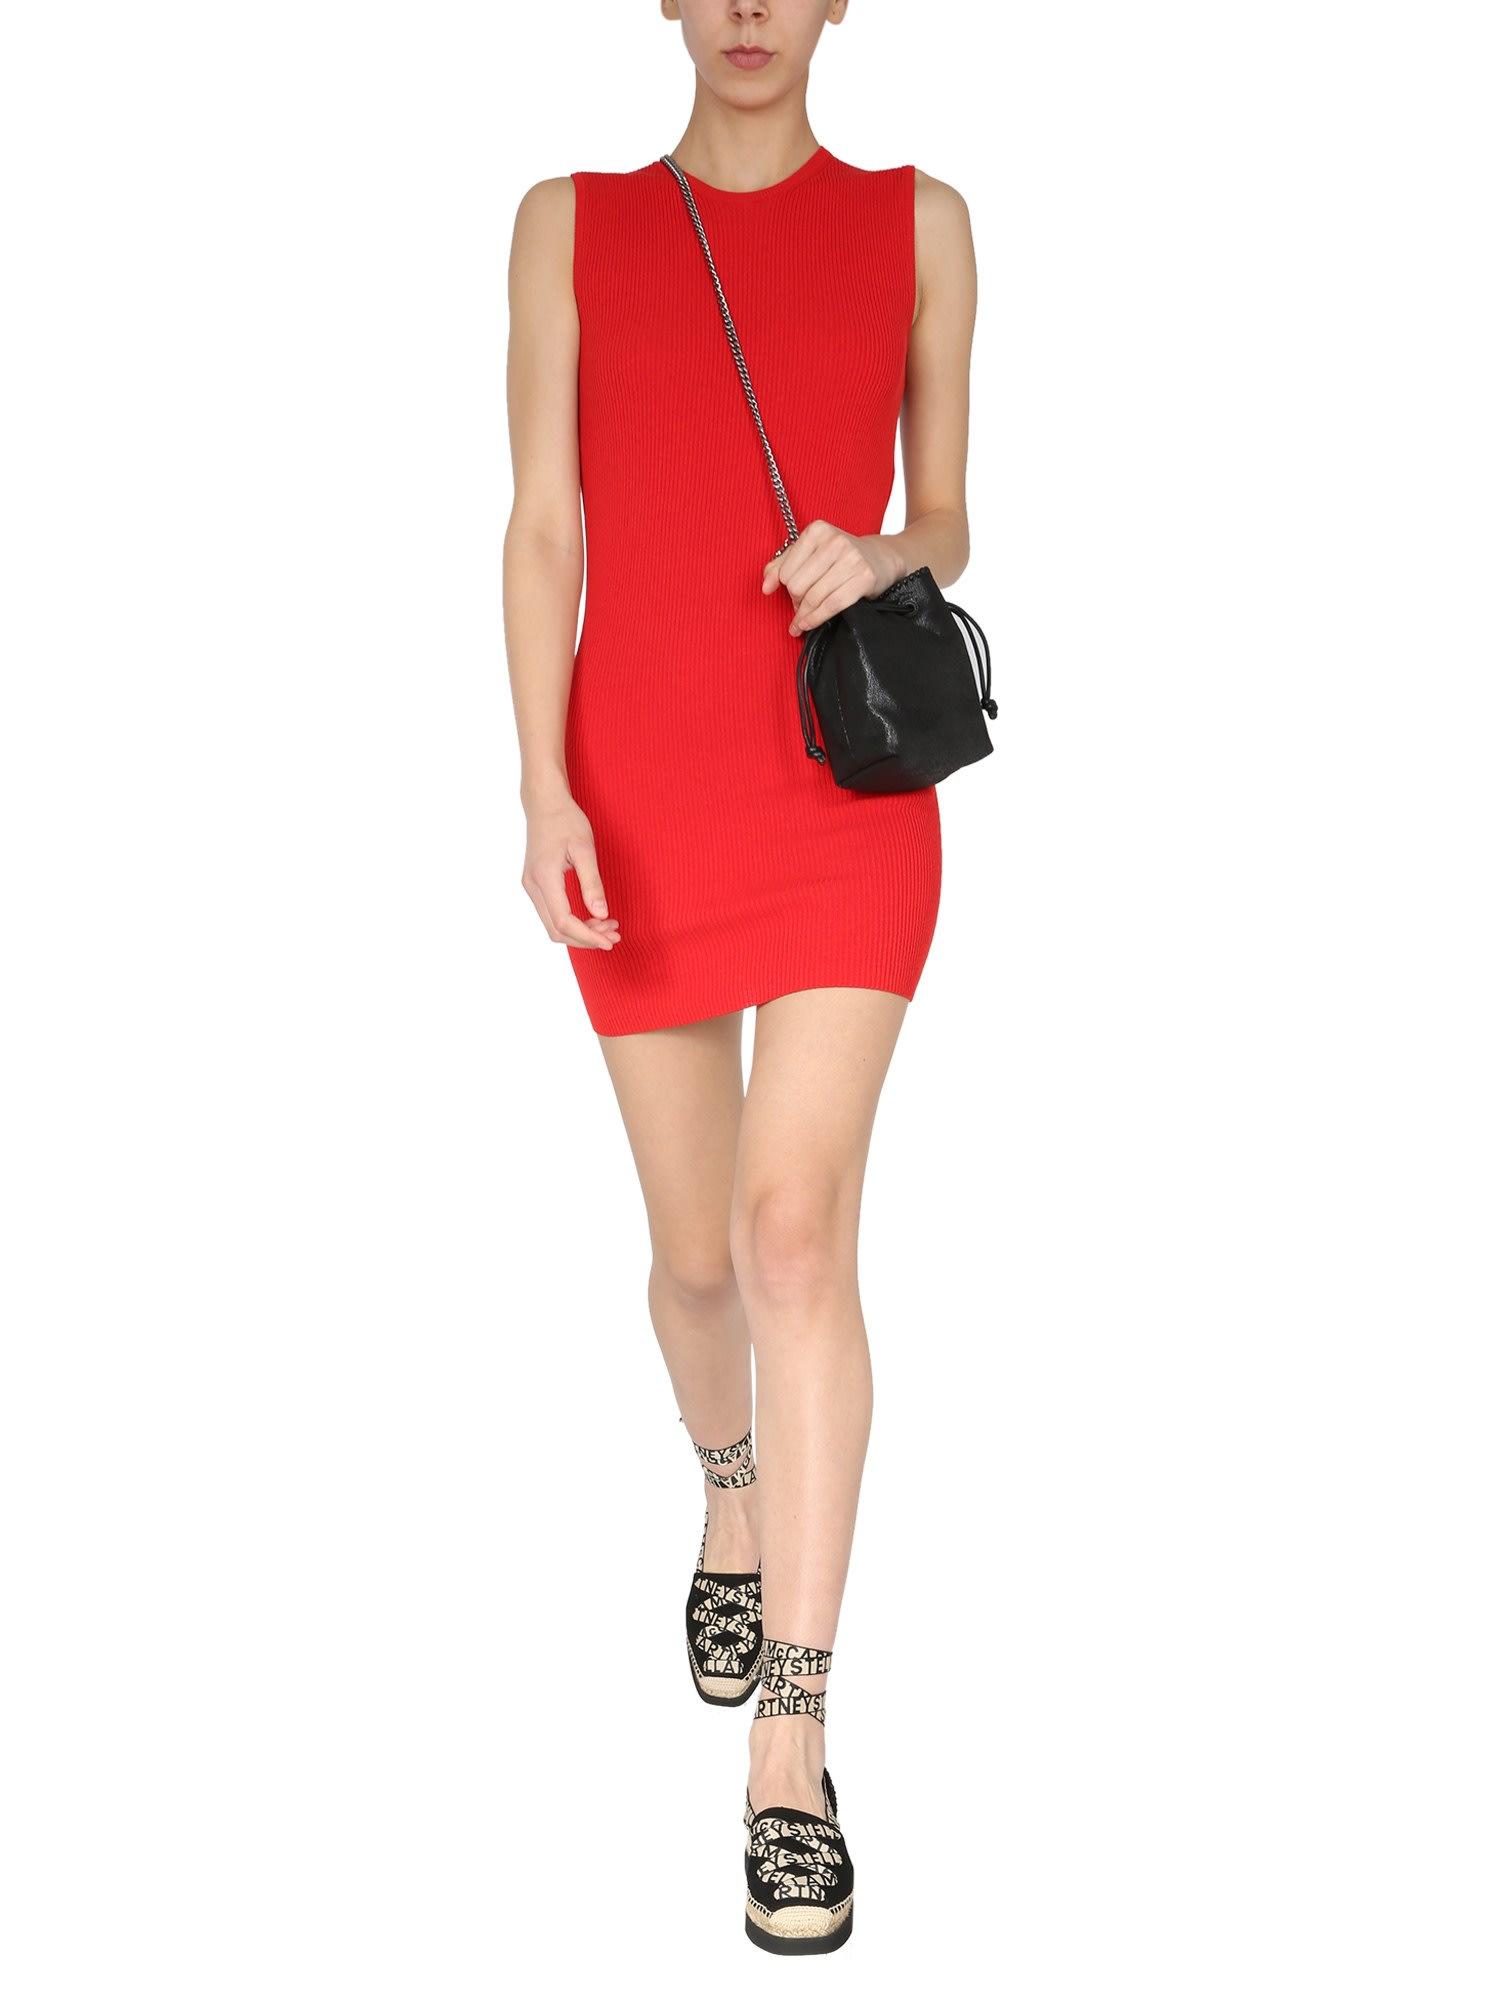 Stella Mccartney Mini dresses RIBBED KNIT DRESS